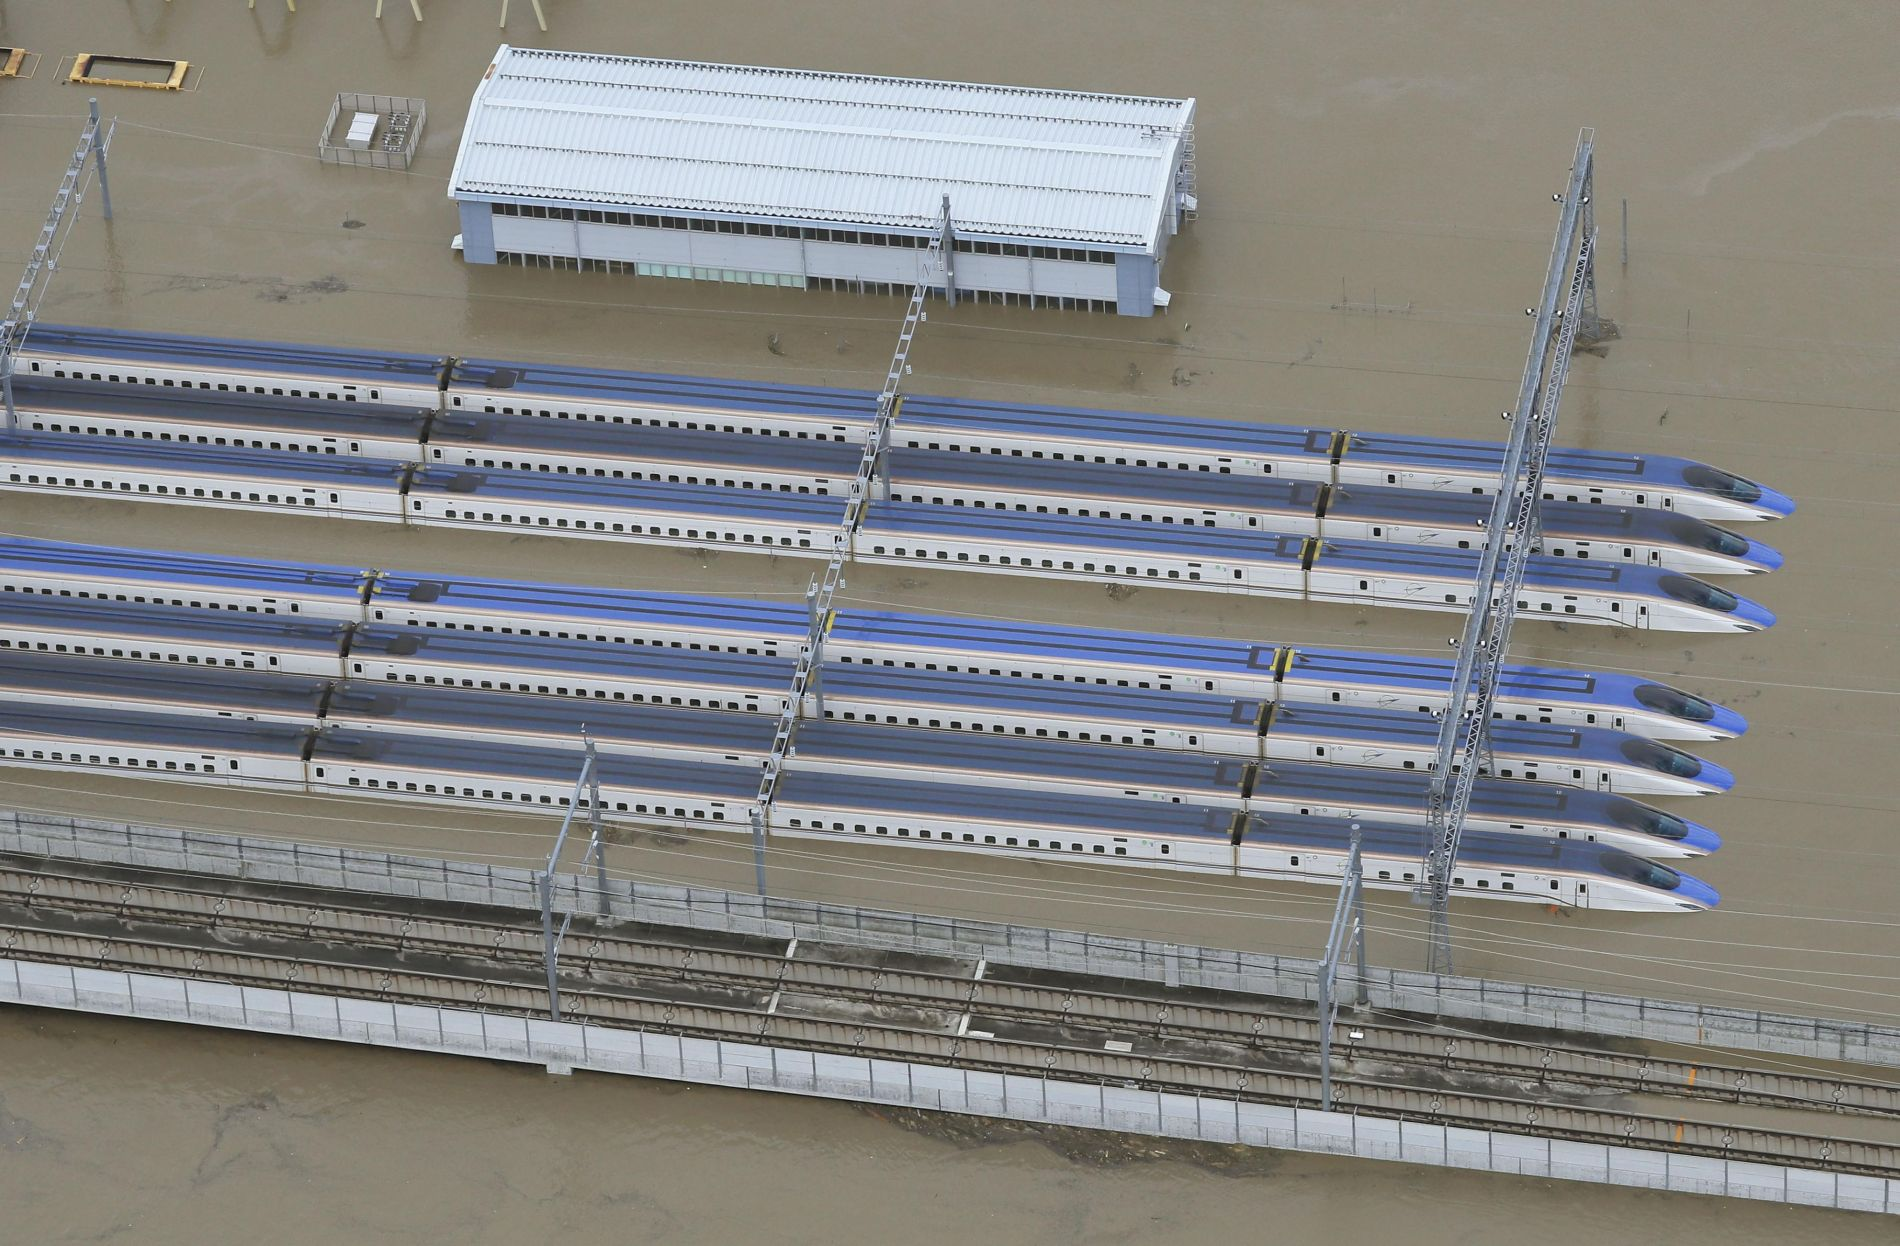 Aftermath of Super Typhoon Hagibis in Japan 017